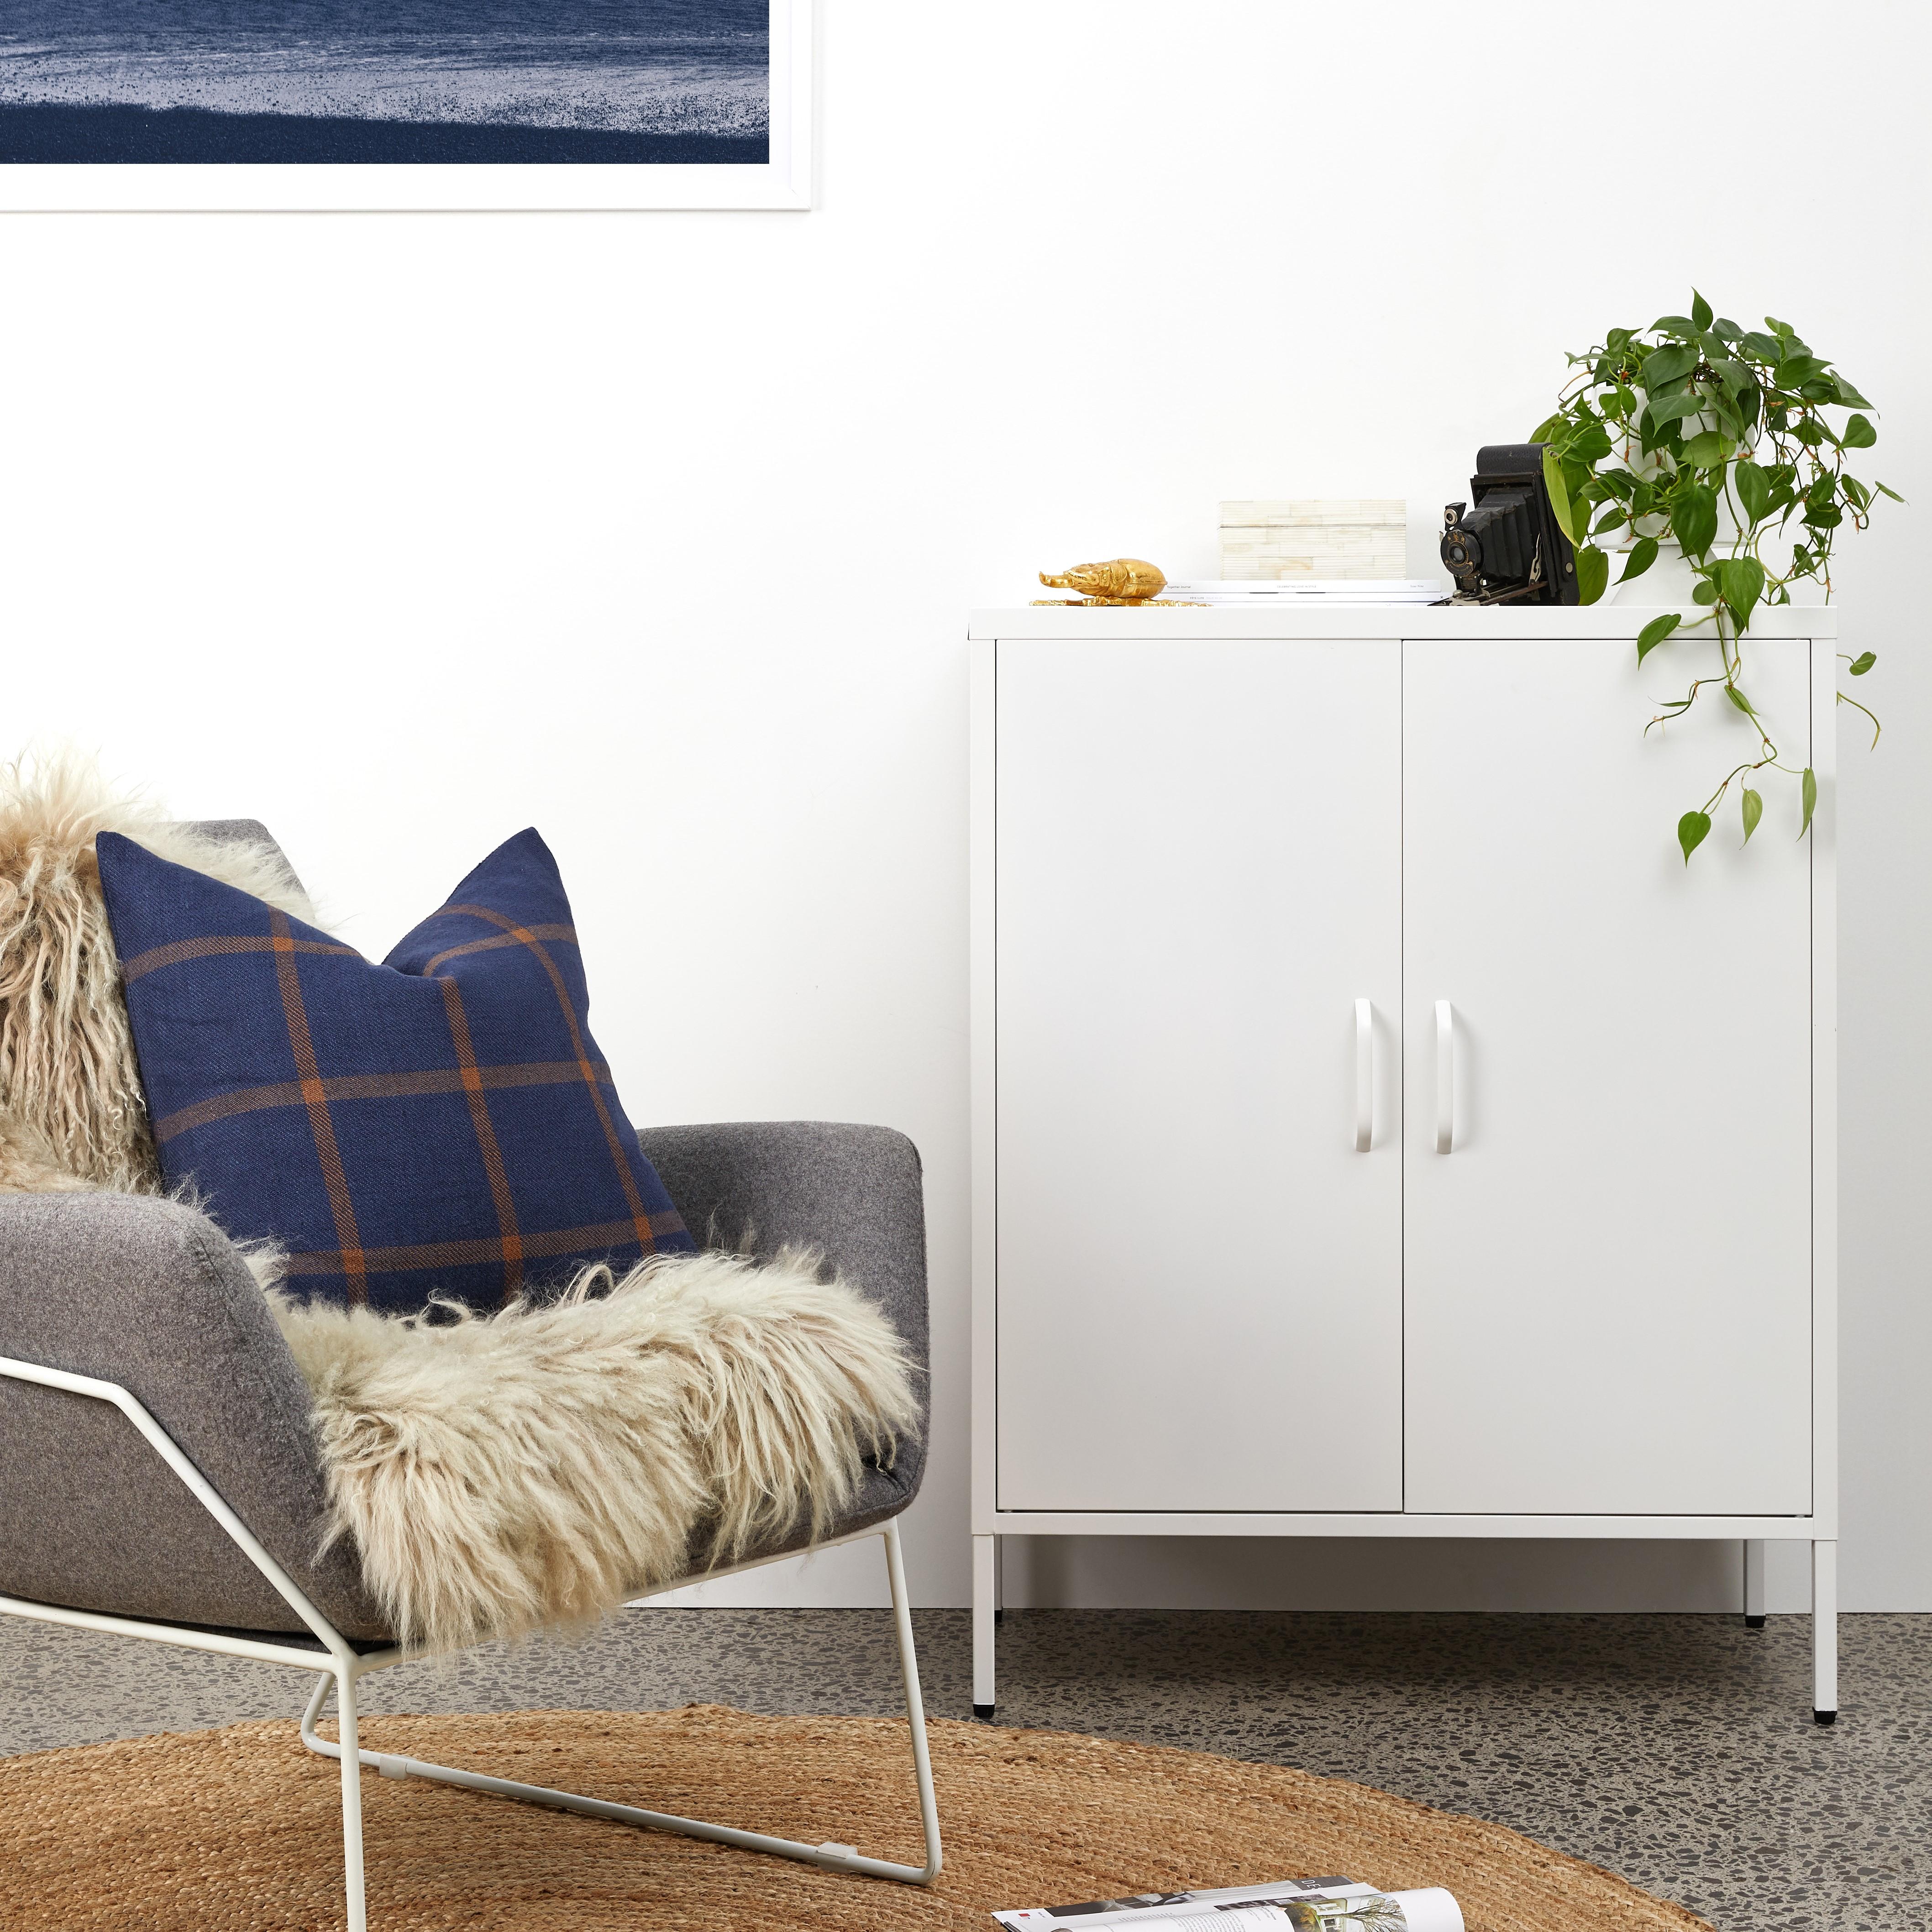 73 Drawer Sets Bedroom Nz New HD